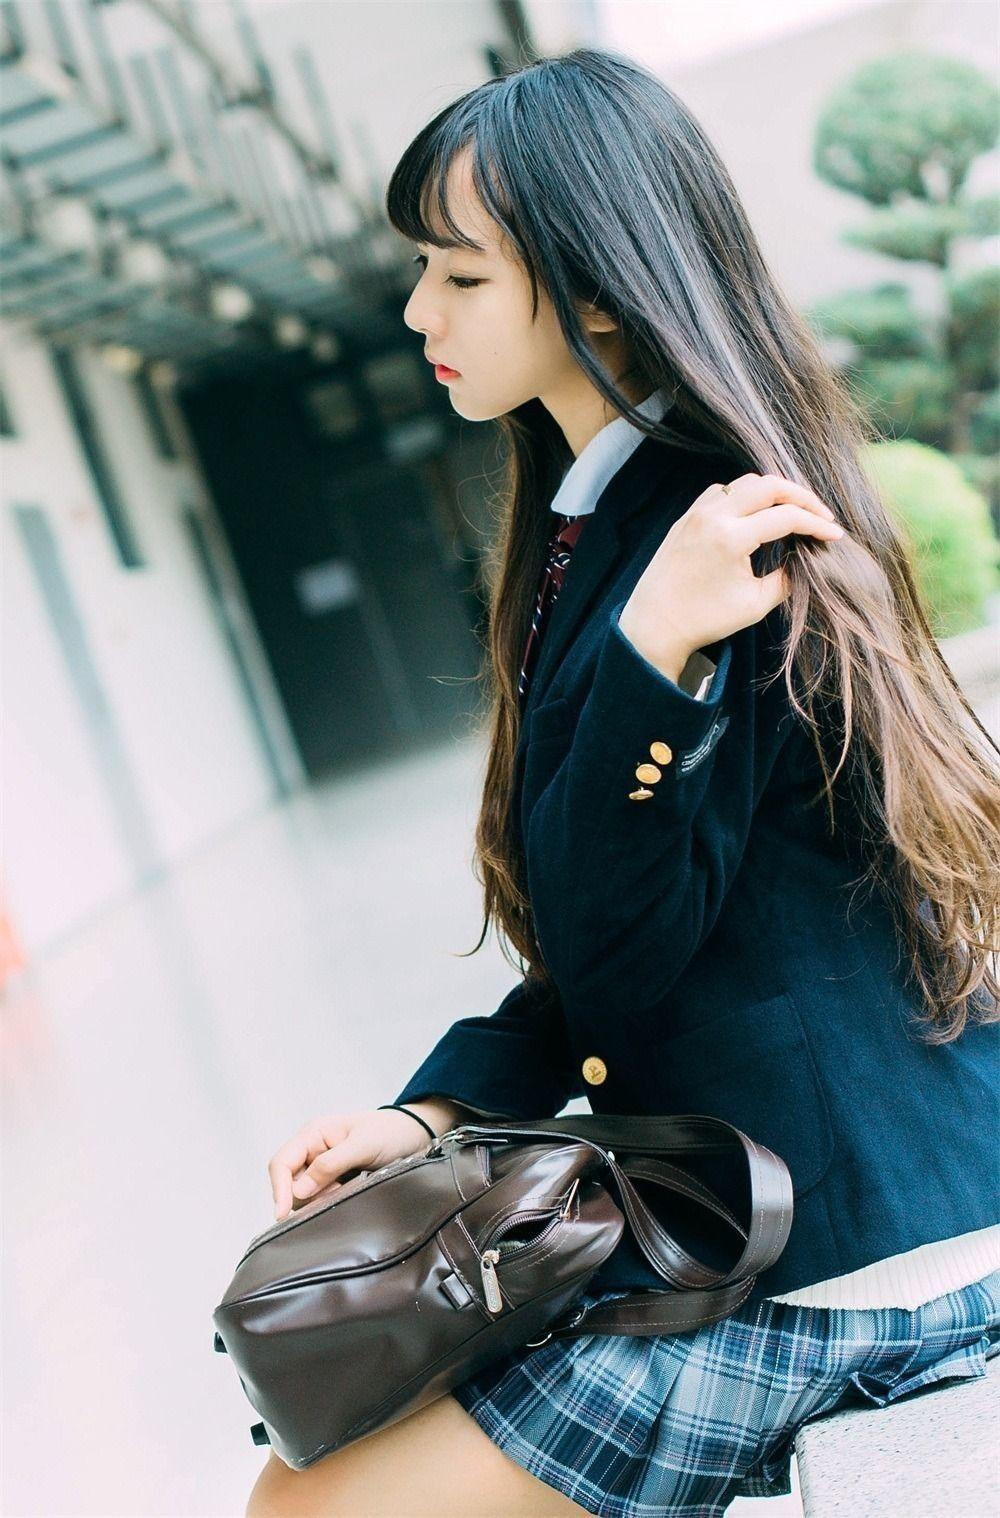 Asian Shemale School Girl